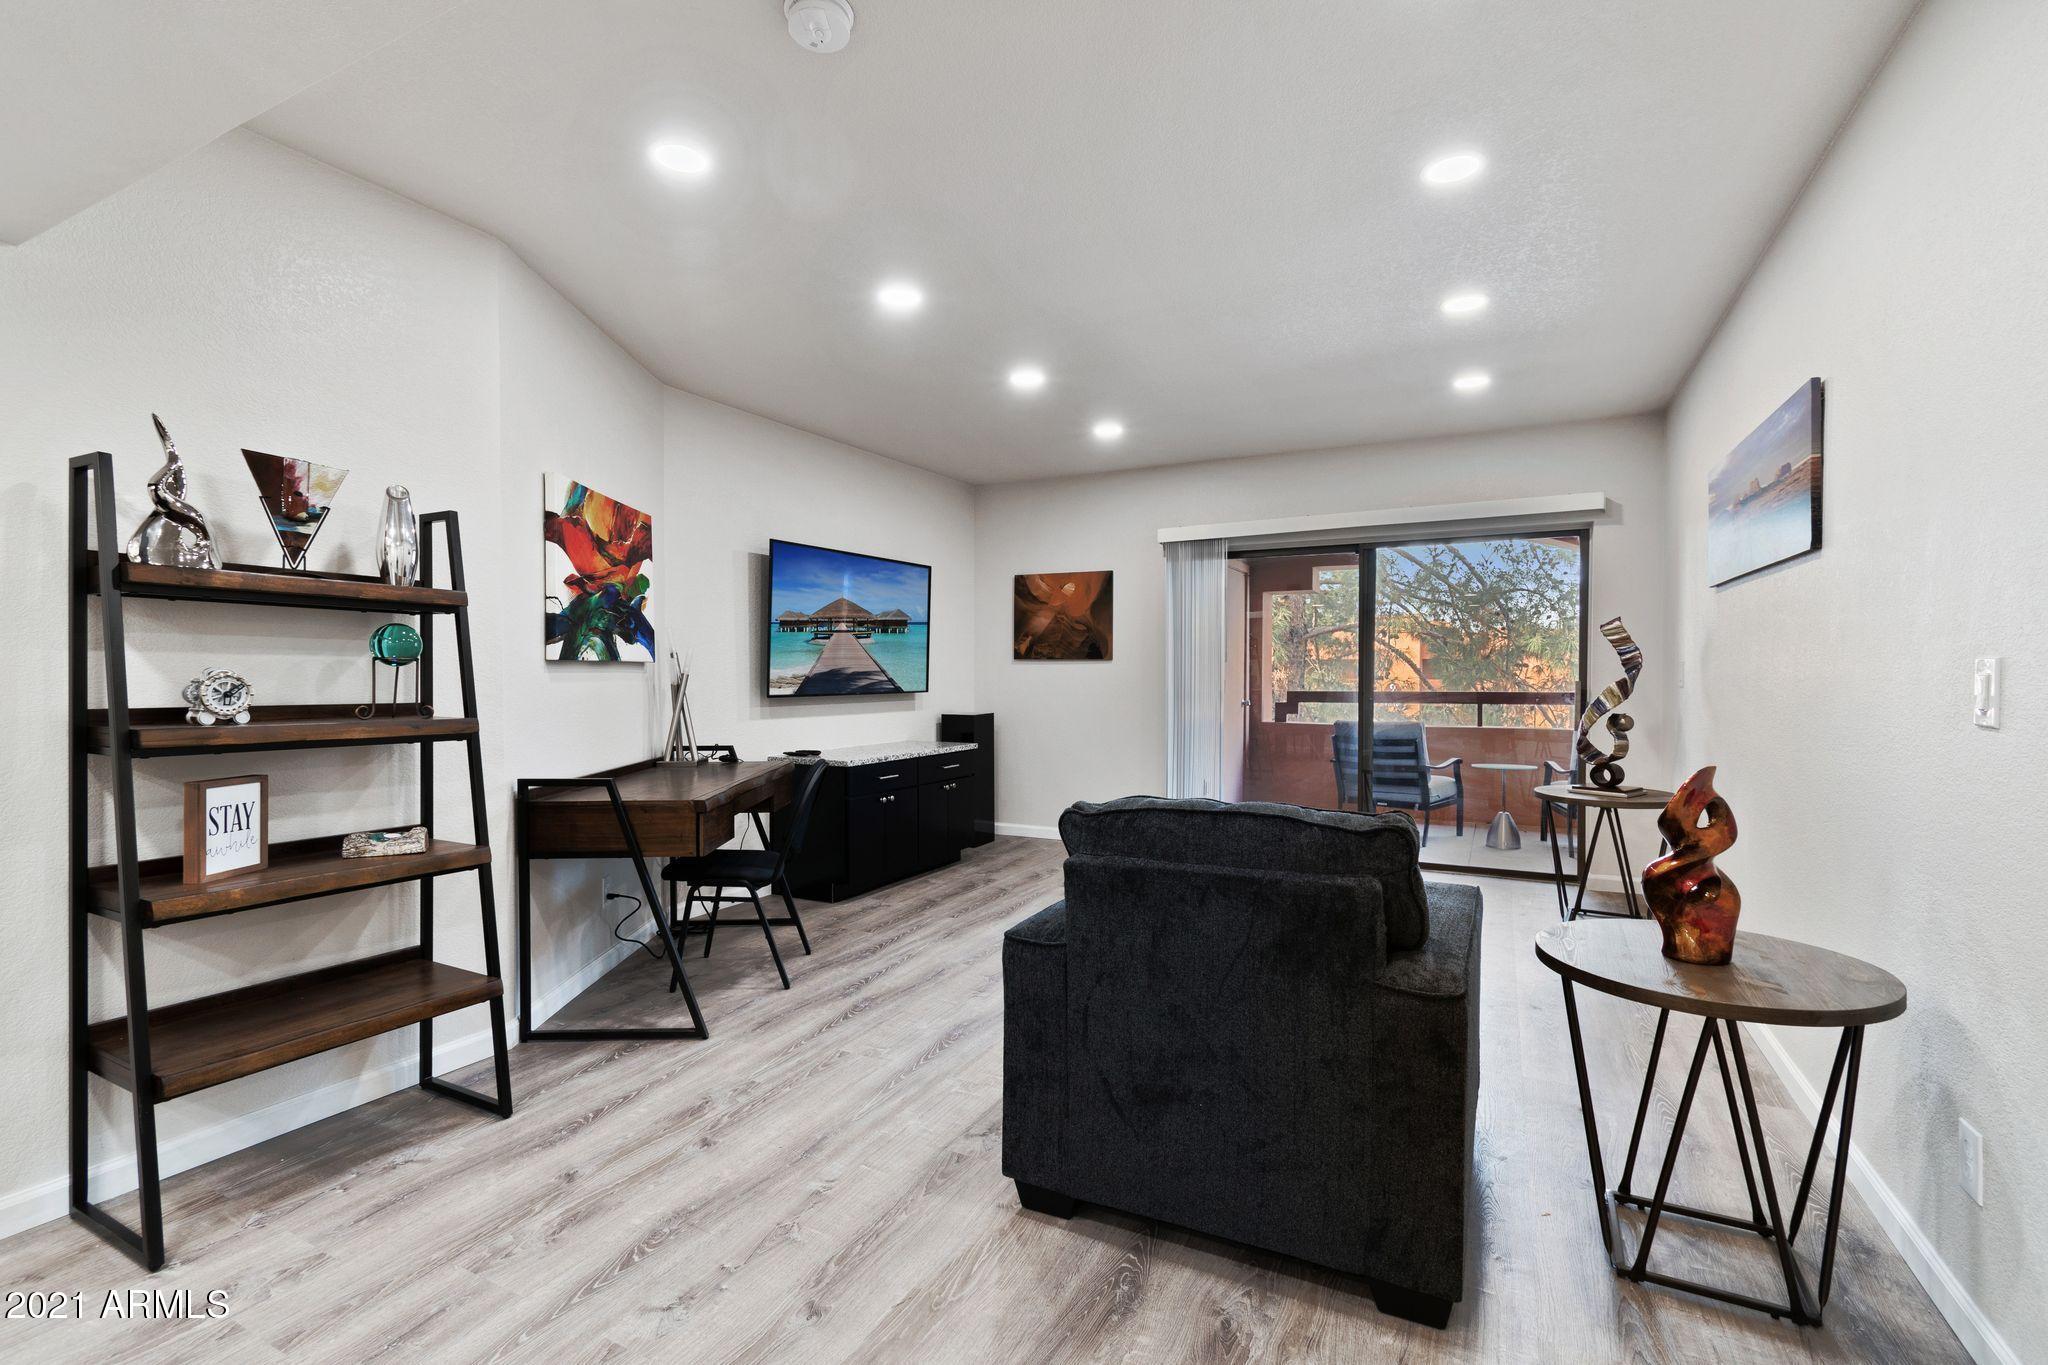 4303 E CACTUS Road # 411, Phoenix, AZ 85032, 2 Bedrooms Bedrooms, ,Residential Lease,For Rent,4303 E CACTUS Road # 411,6186499